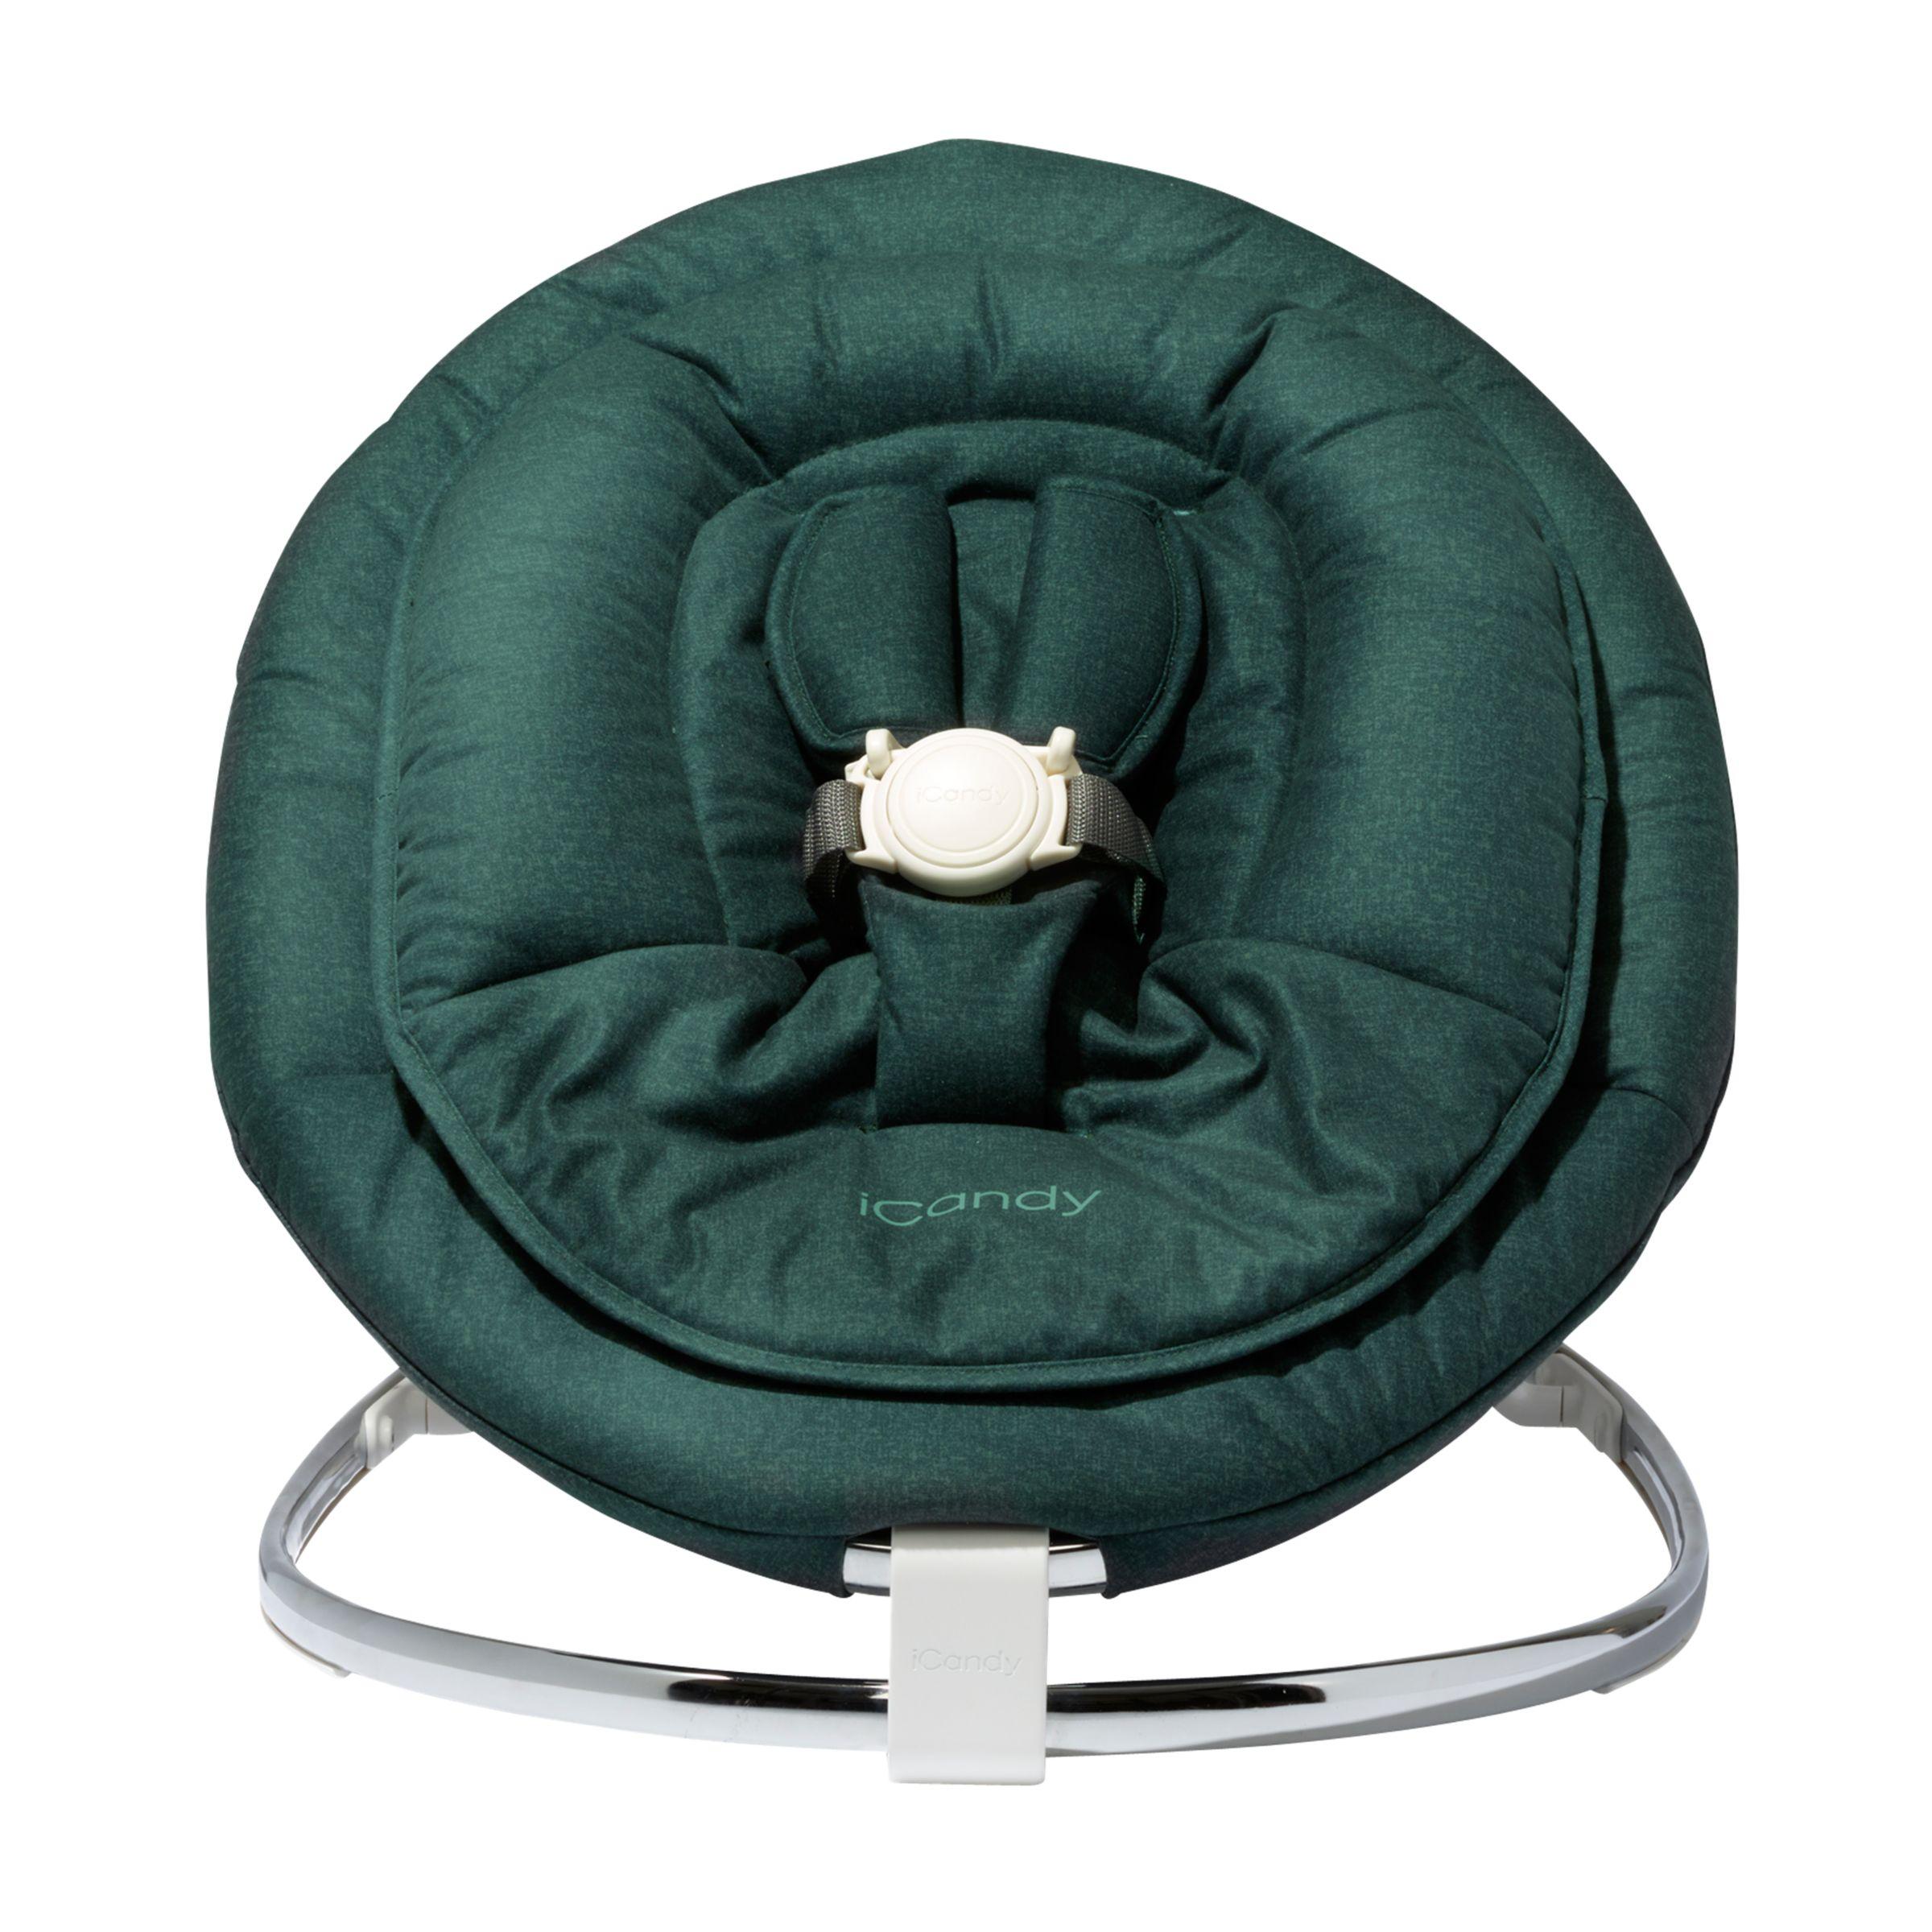 iCandy iCandy MiChair Newborn Pod